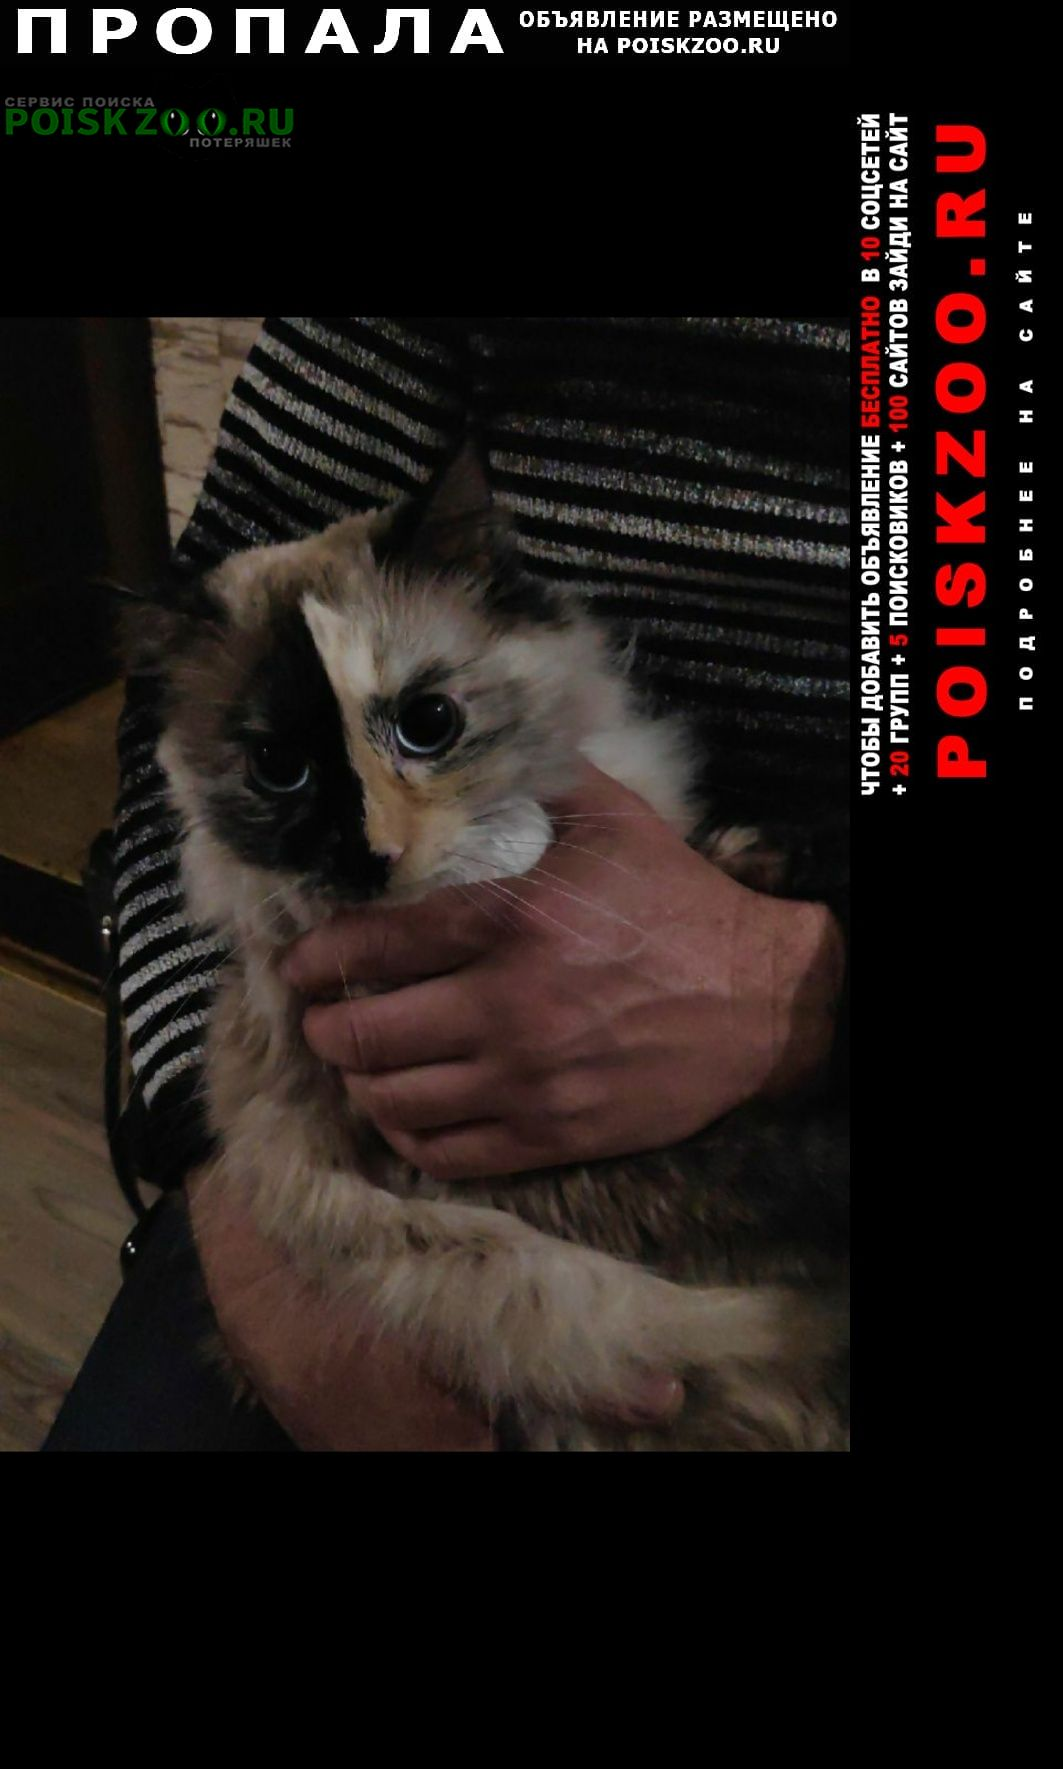 Пропала кошка отзывается на кличку габи Алушта